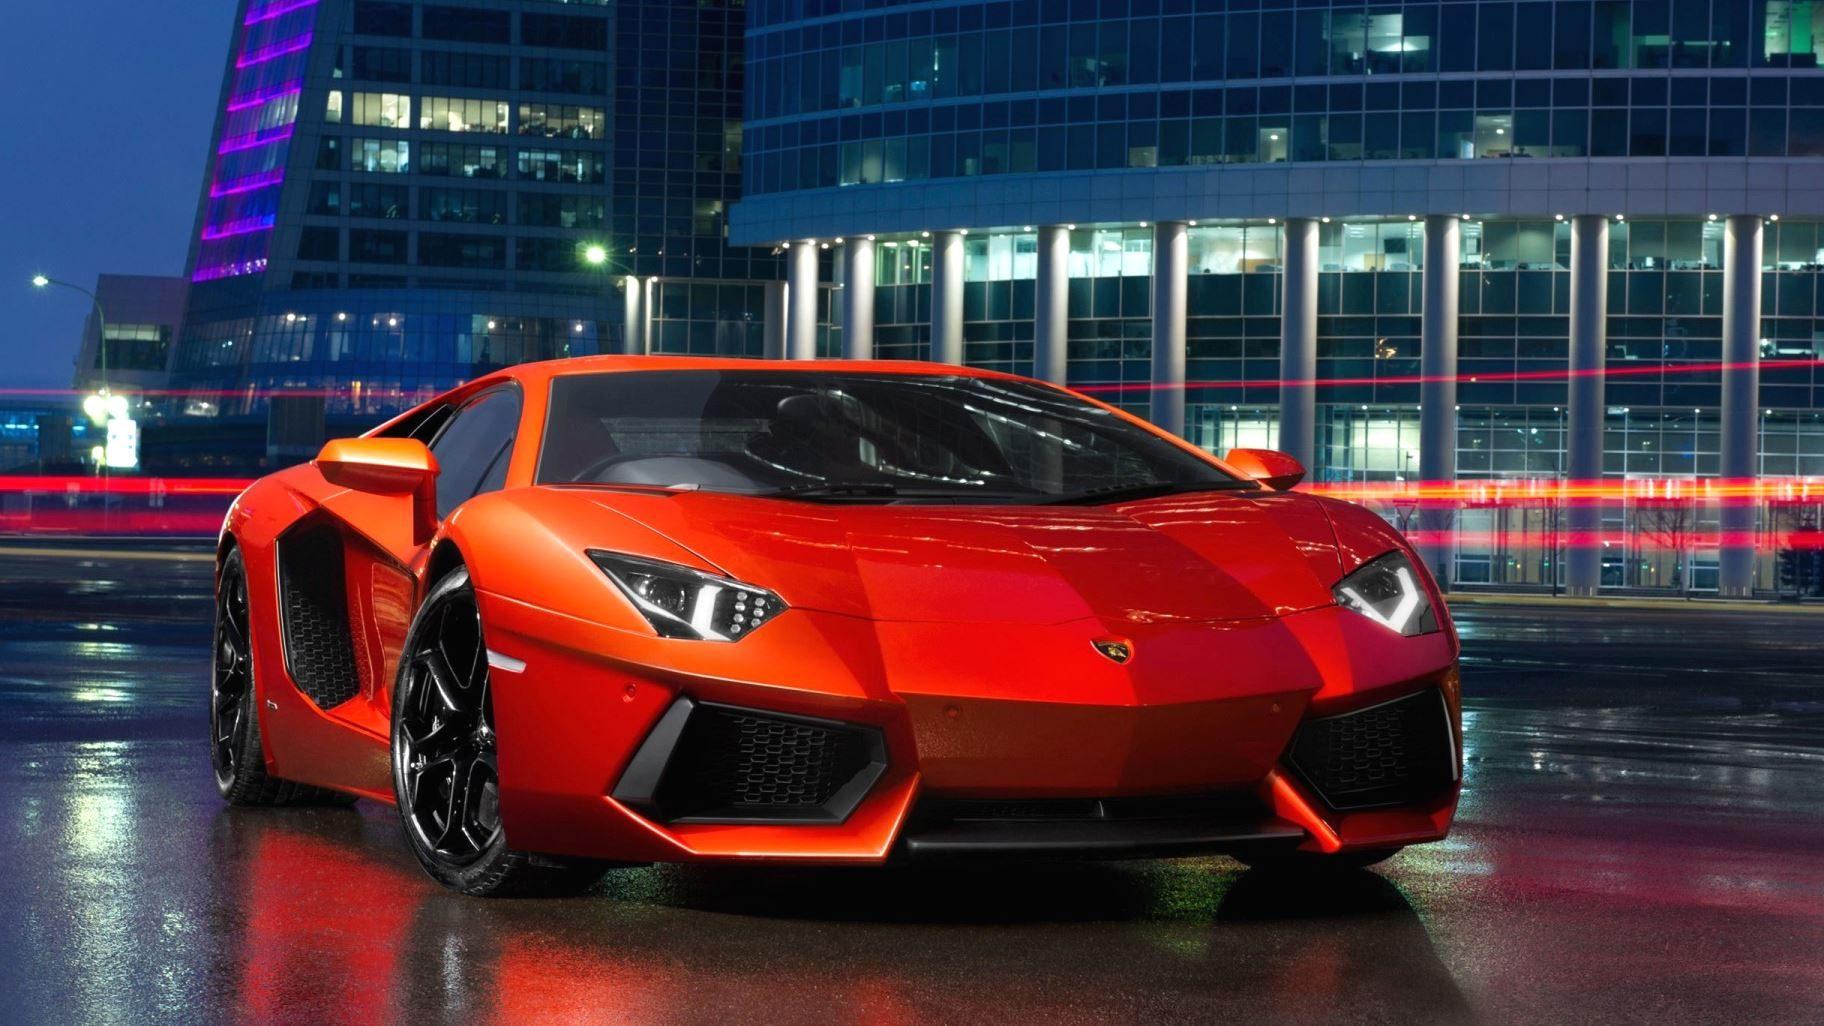 Lamborghini Car Hd Wallpaper For Pc Free Picture Automotive Car Coupe Sport Car